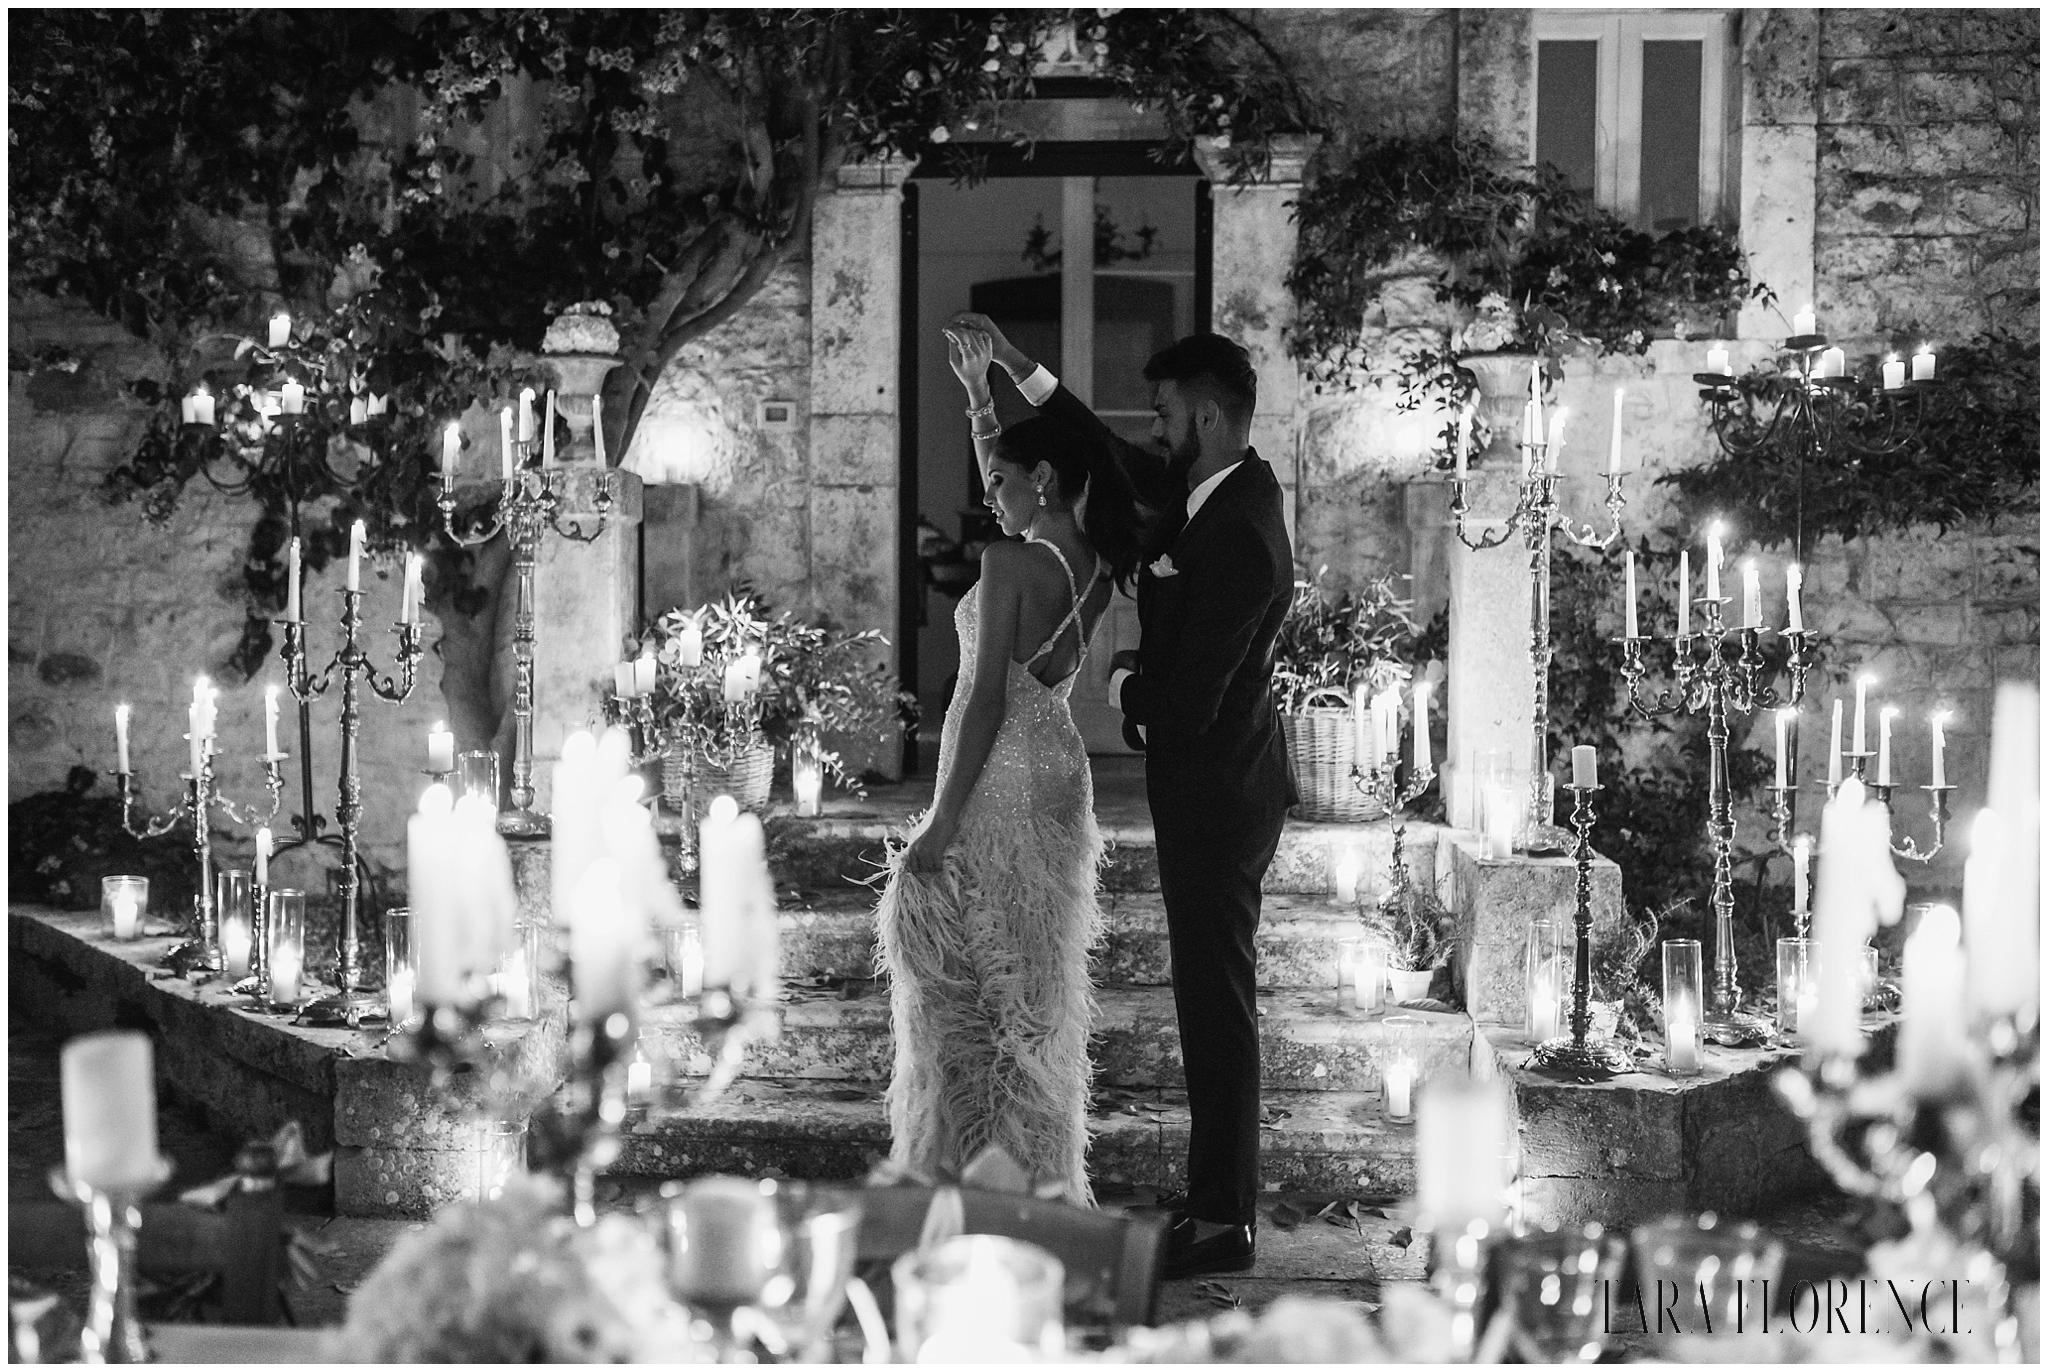 Puglia-Tara-Florence-Bridal-Editorial-185_WEB.jpg